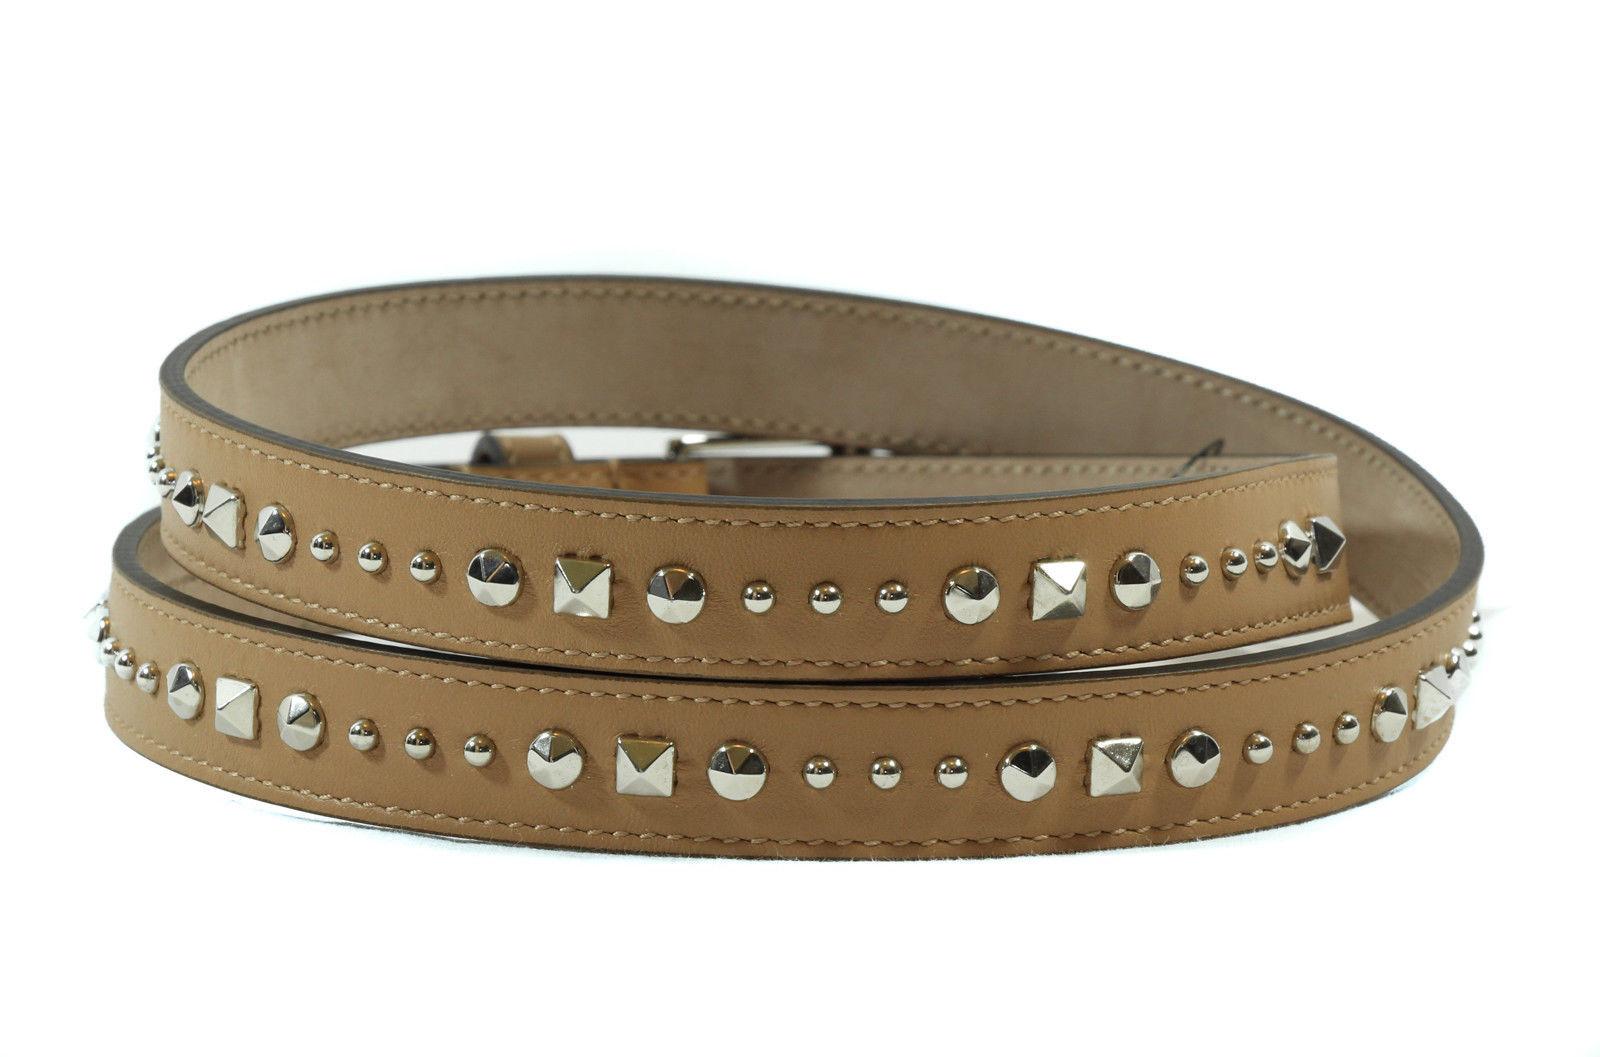 0651a3c25bb24 NWT GUCCI 380561 Studded Leather Belt